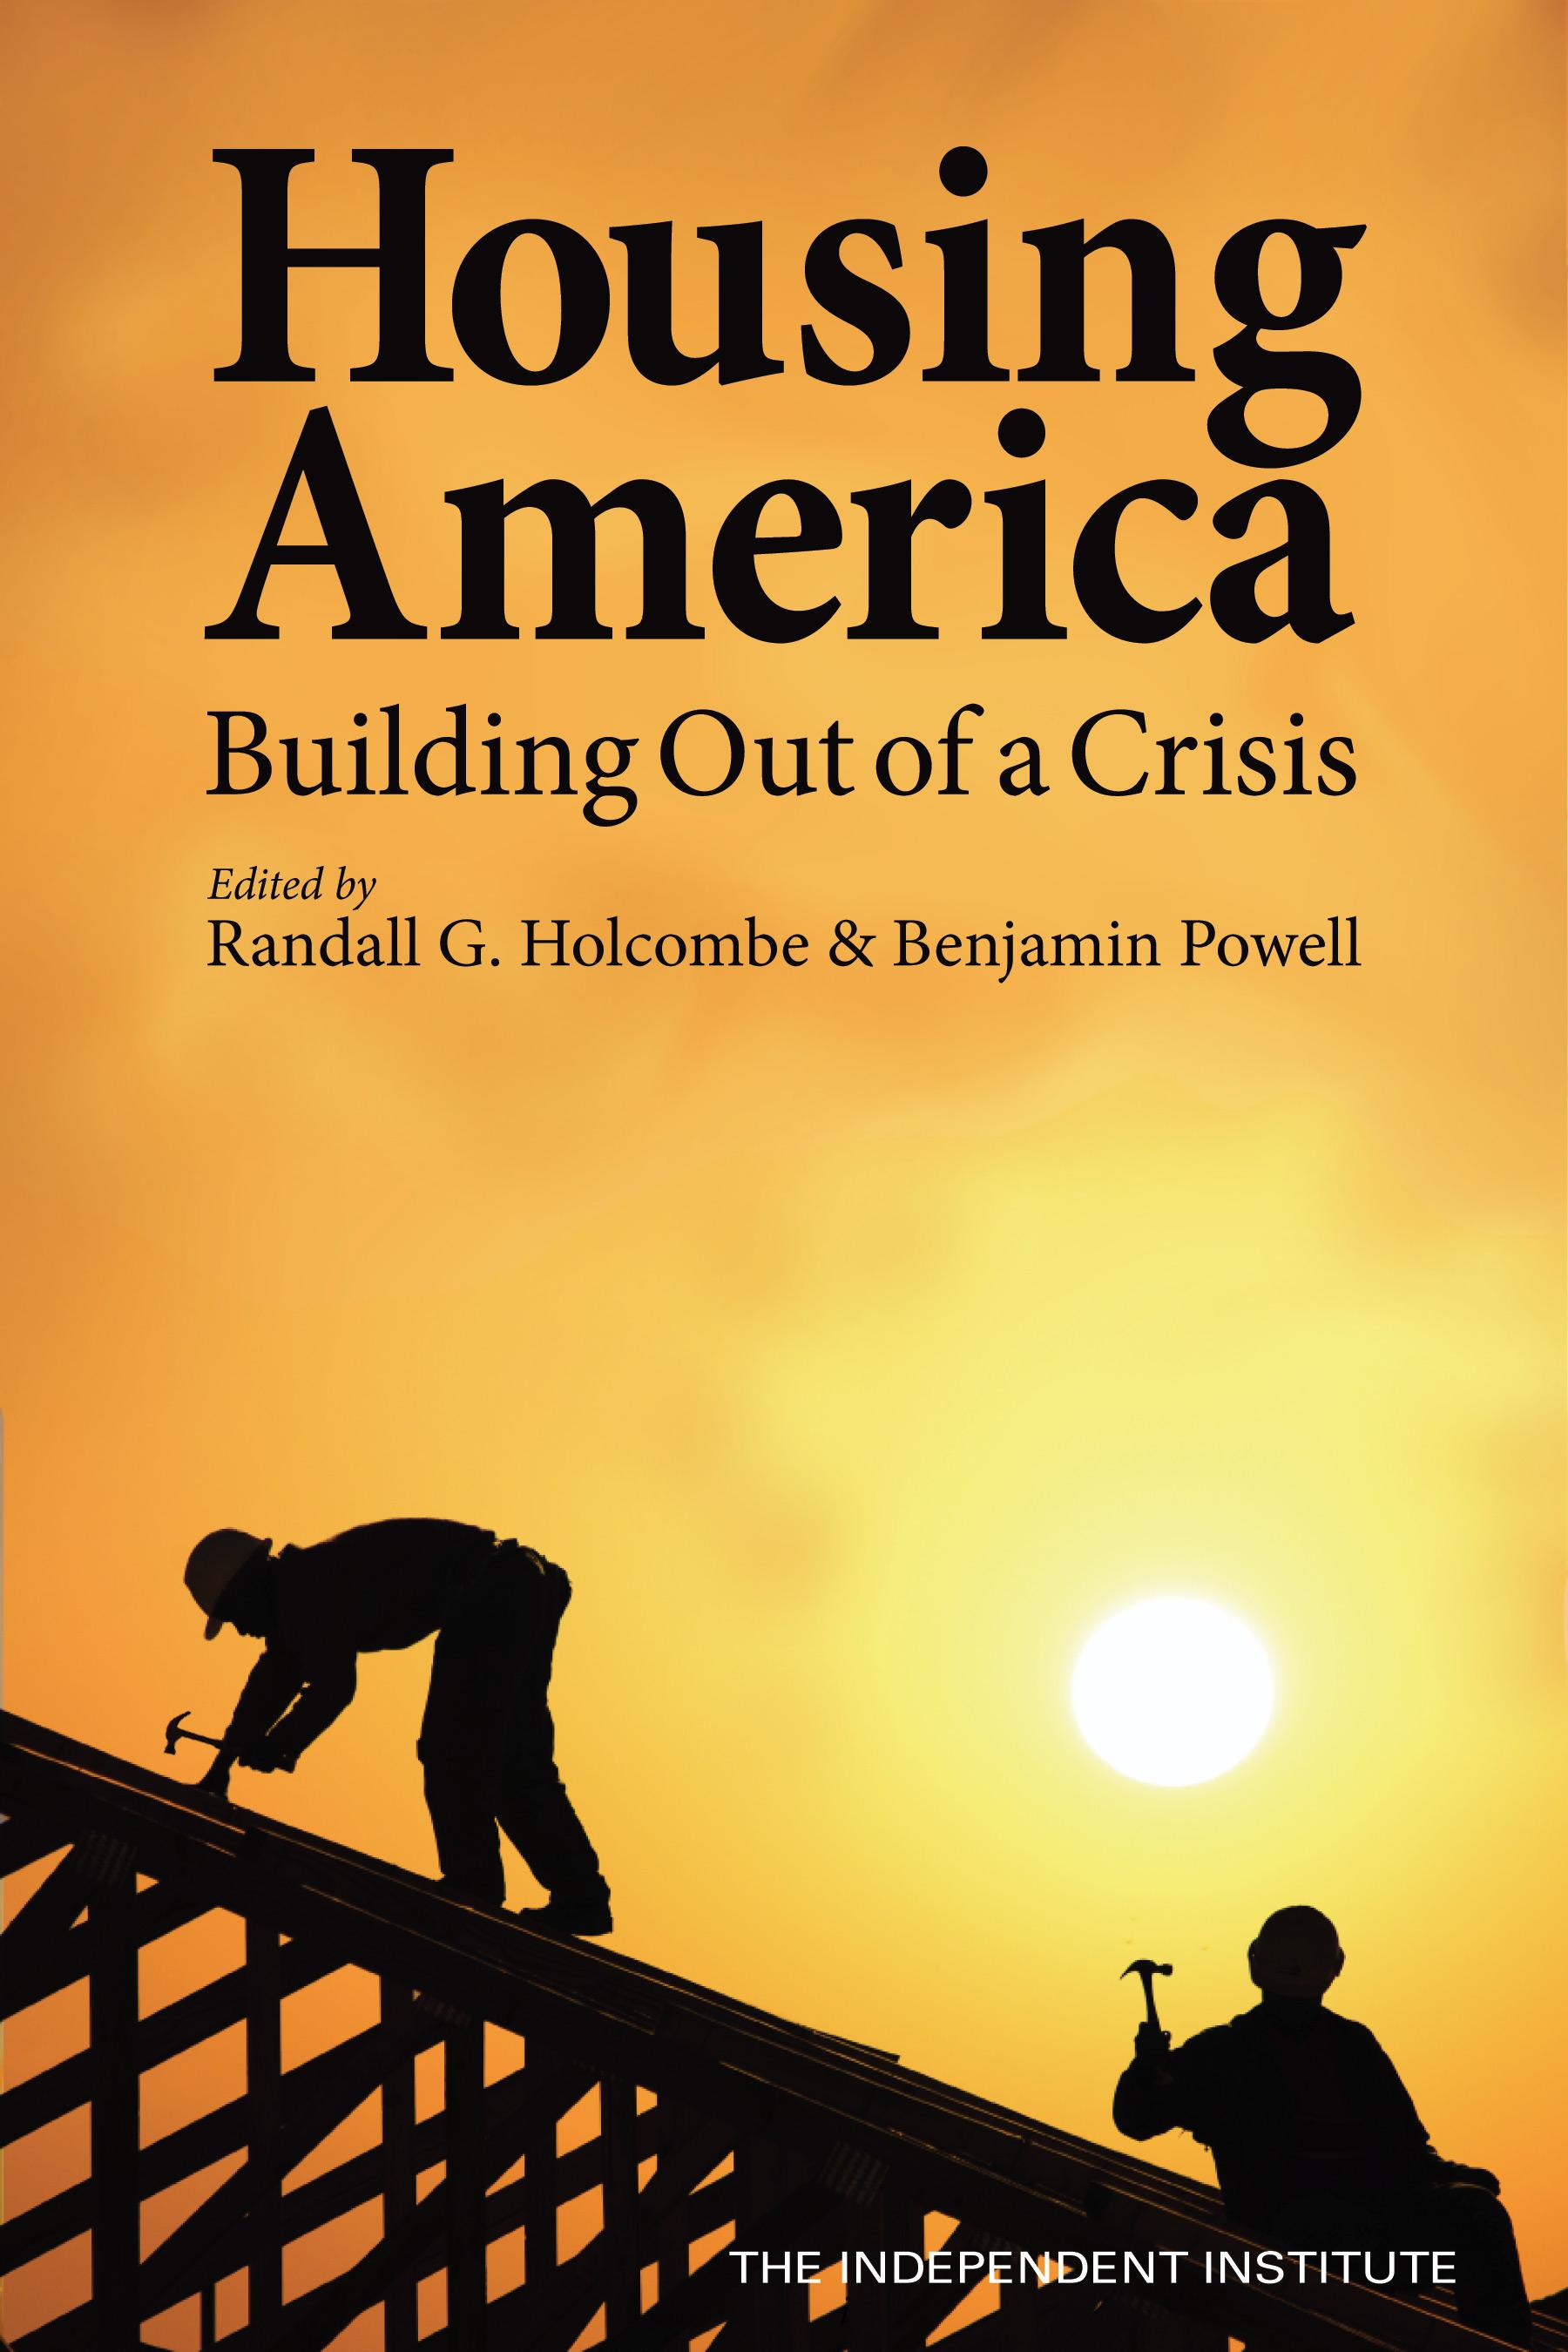 housing_america_1800